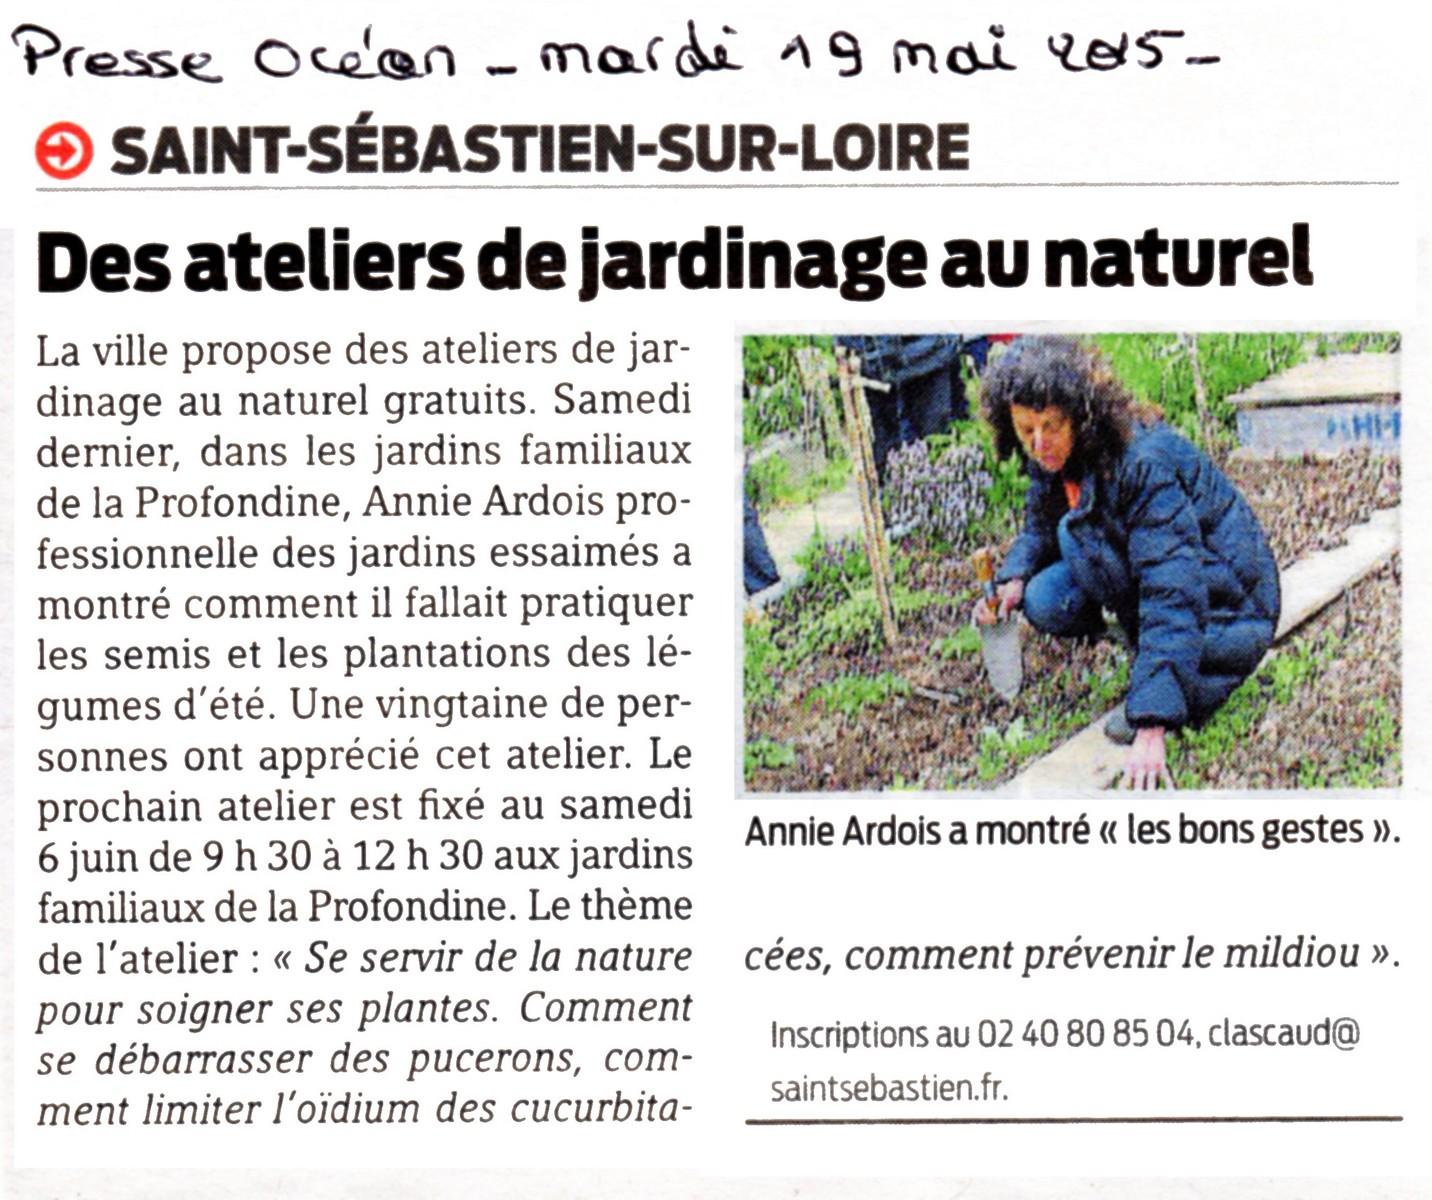 "Article de Presse Océan ""Des ateliers de jardinage au naturel"""